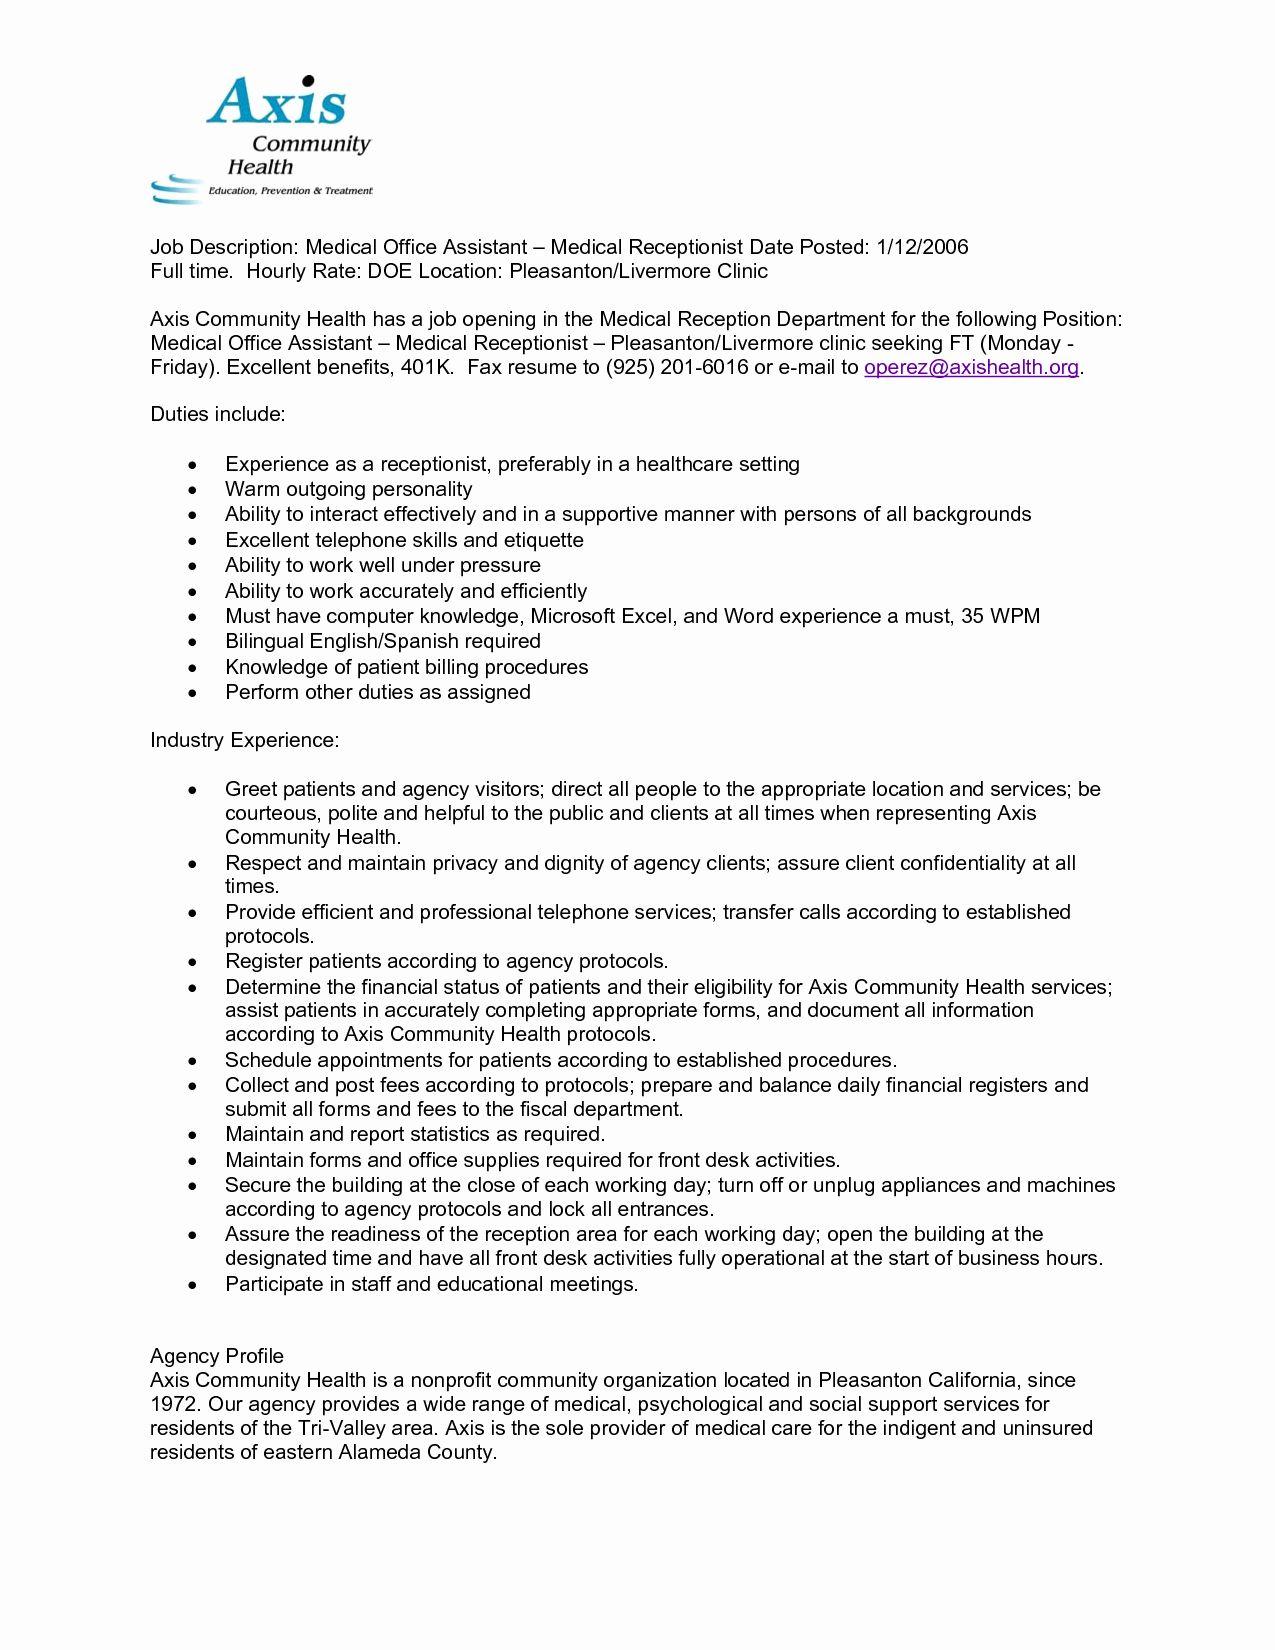 Front Desk Job Description Resume Beautiful 12 Medical